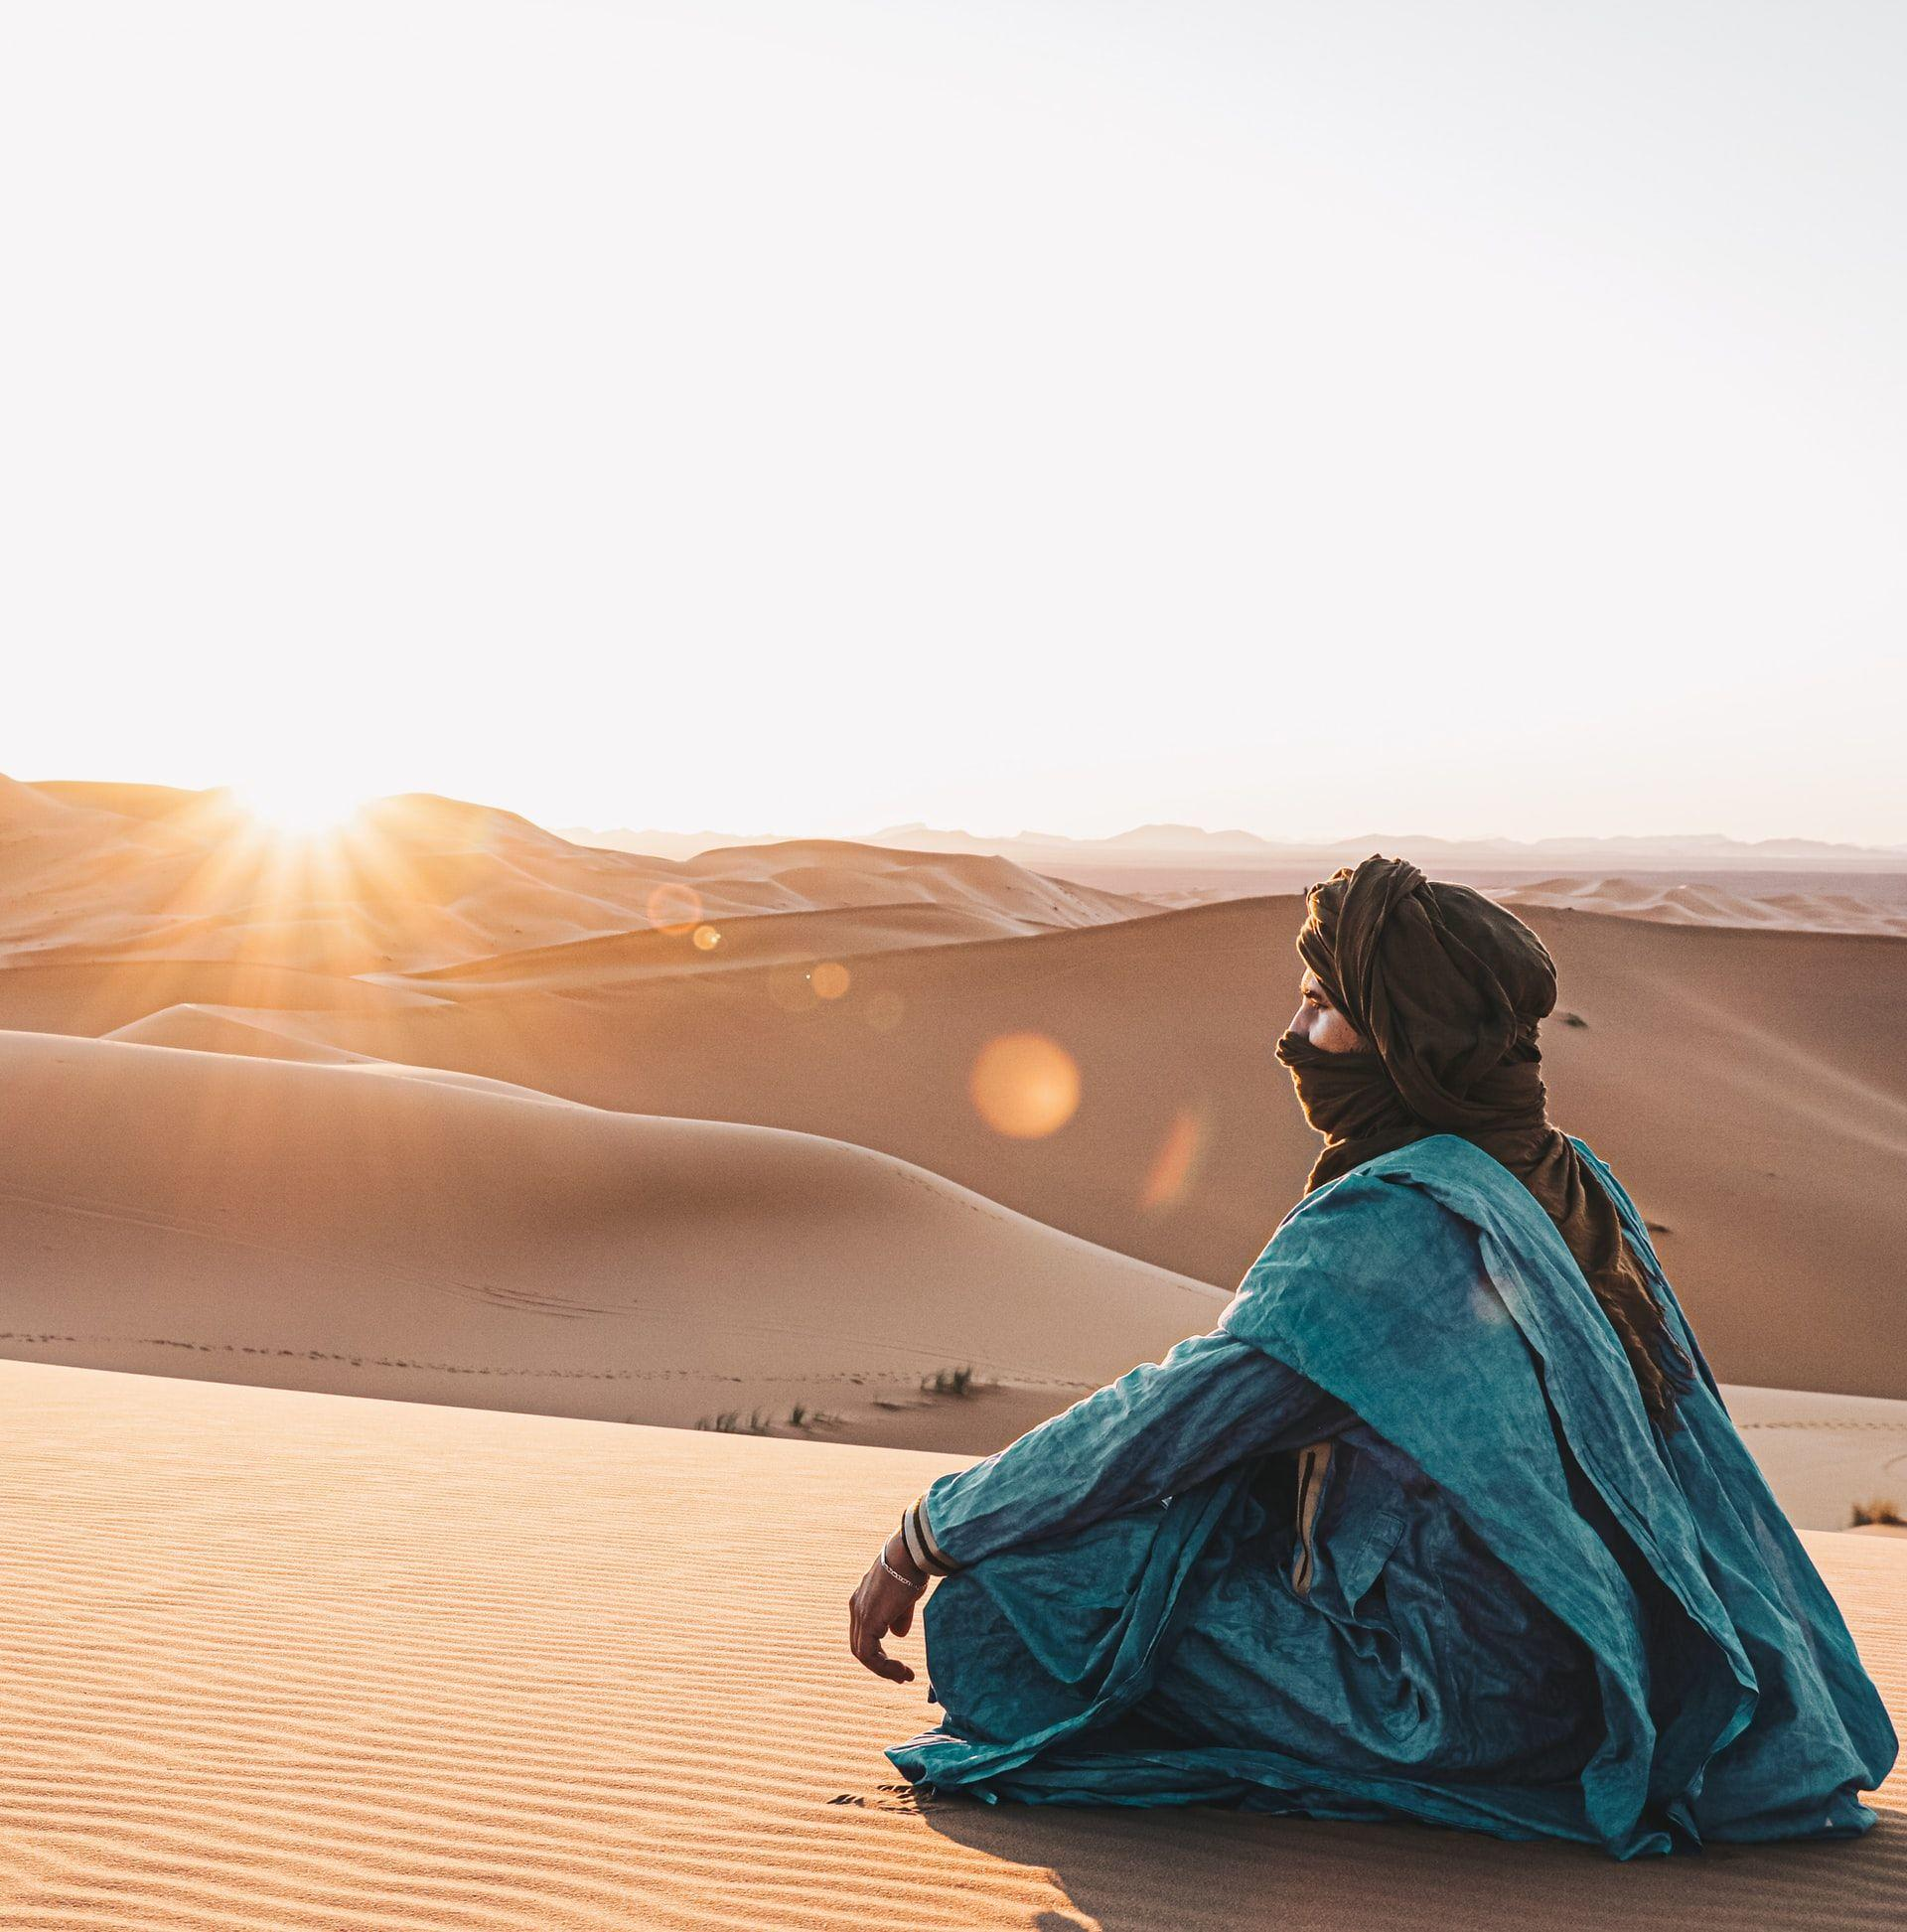 Viaje por Marruecos 8 dias- Tour itinerario desde Casablanca